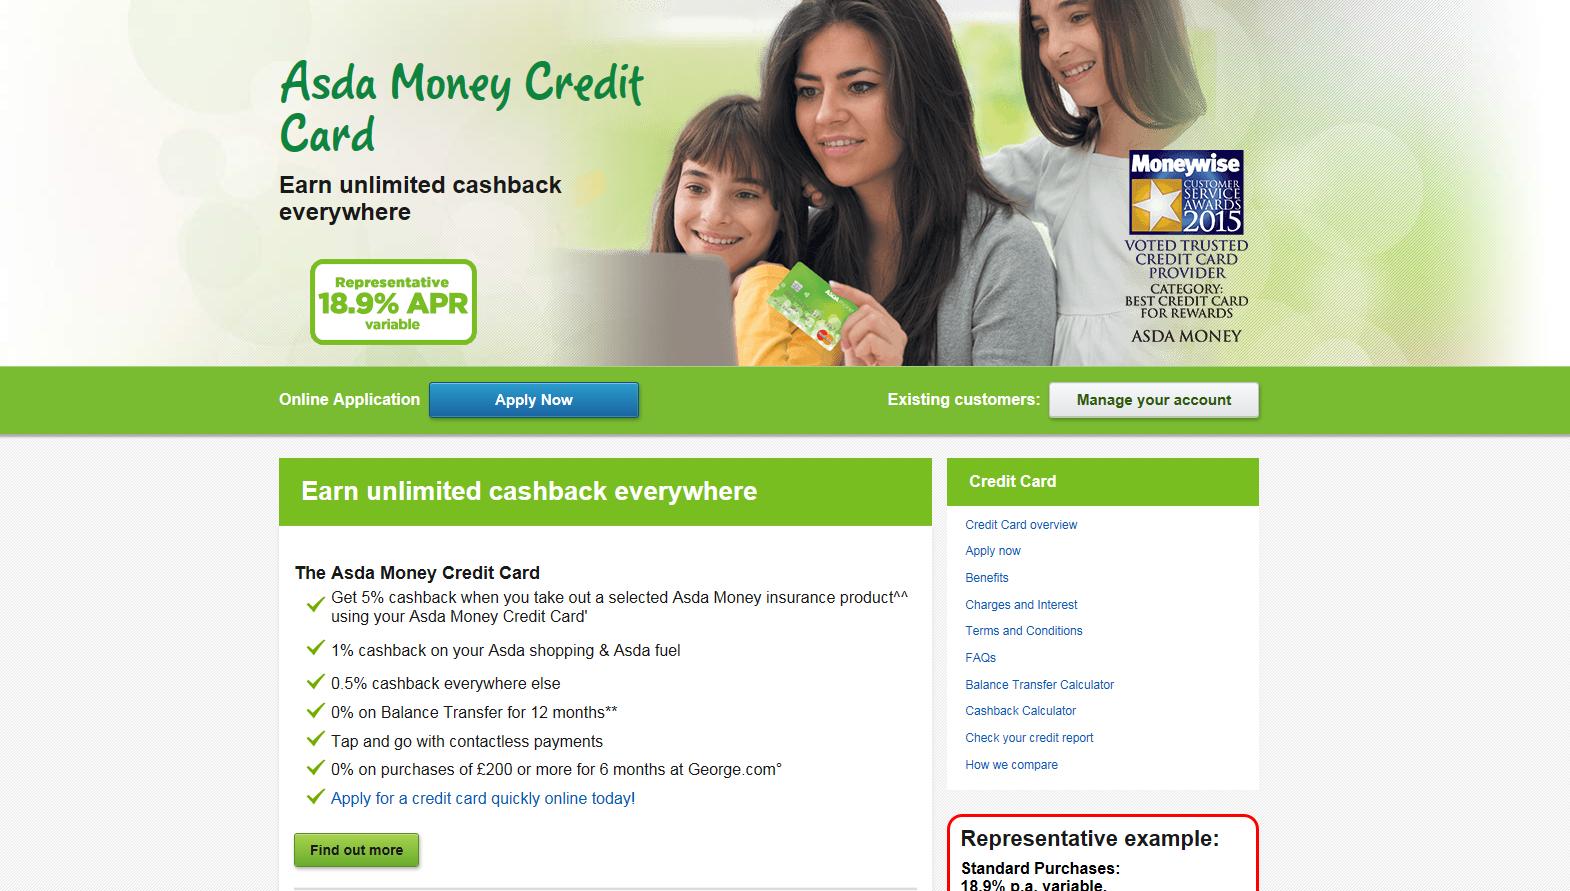 Asda Money website